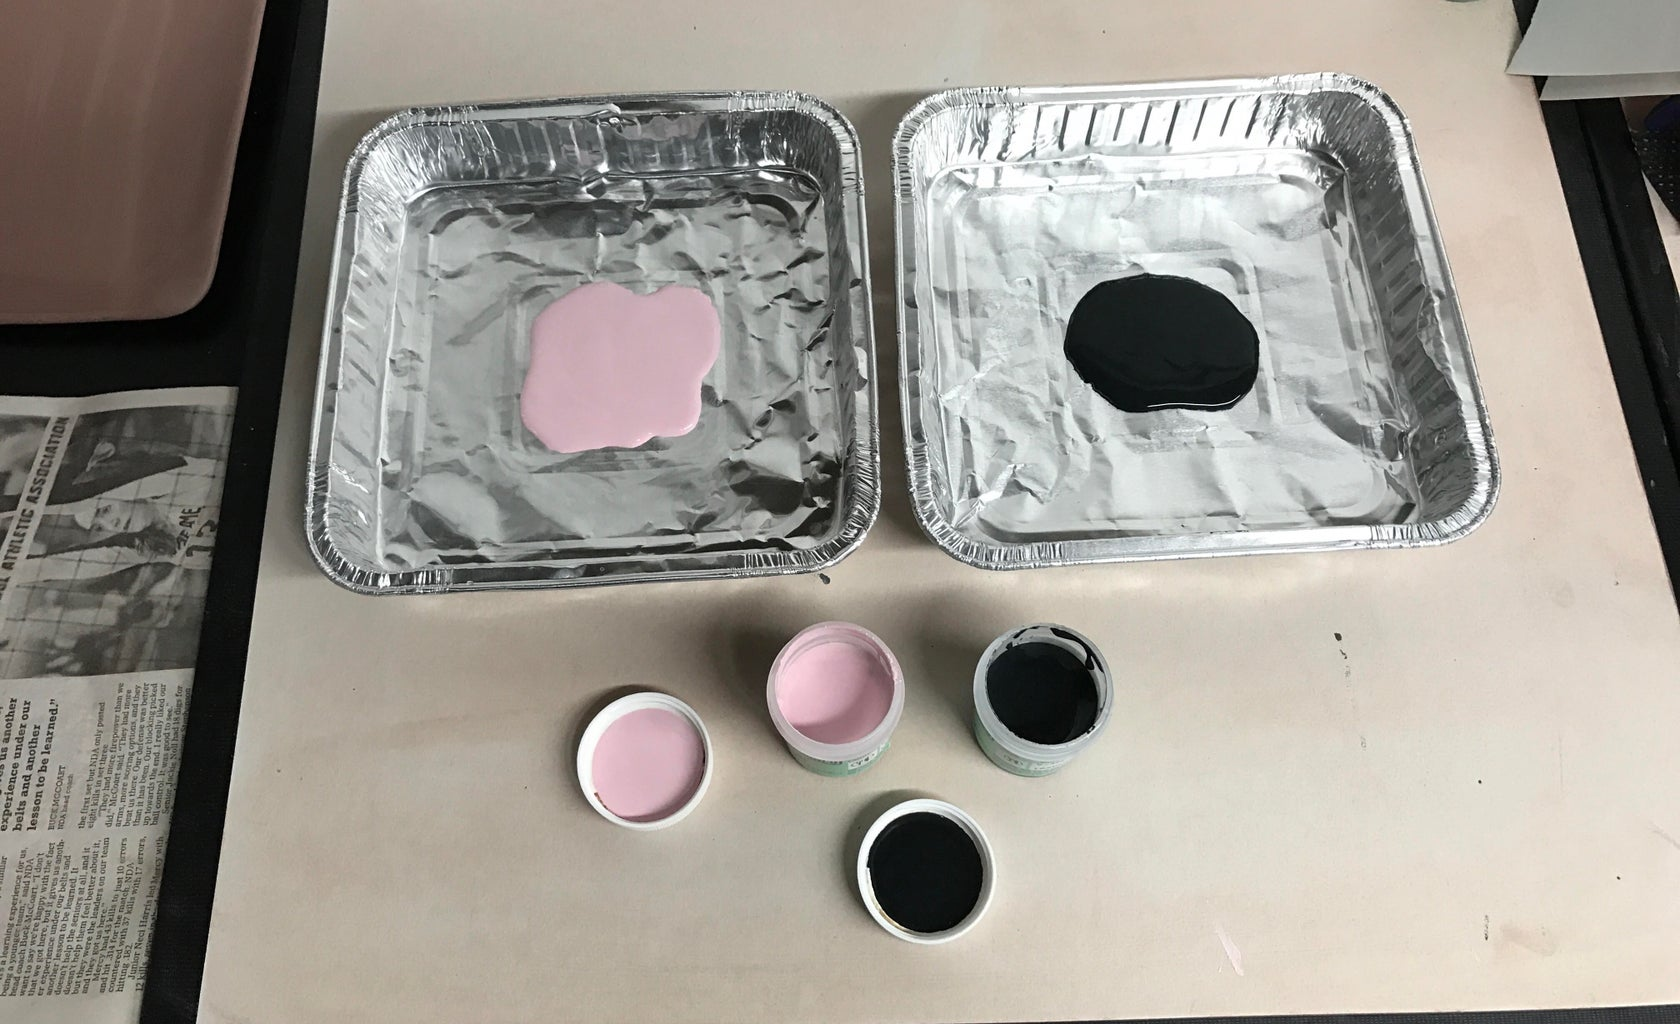 Create Ink Out of Amaco Velvet Underglaze